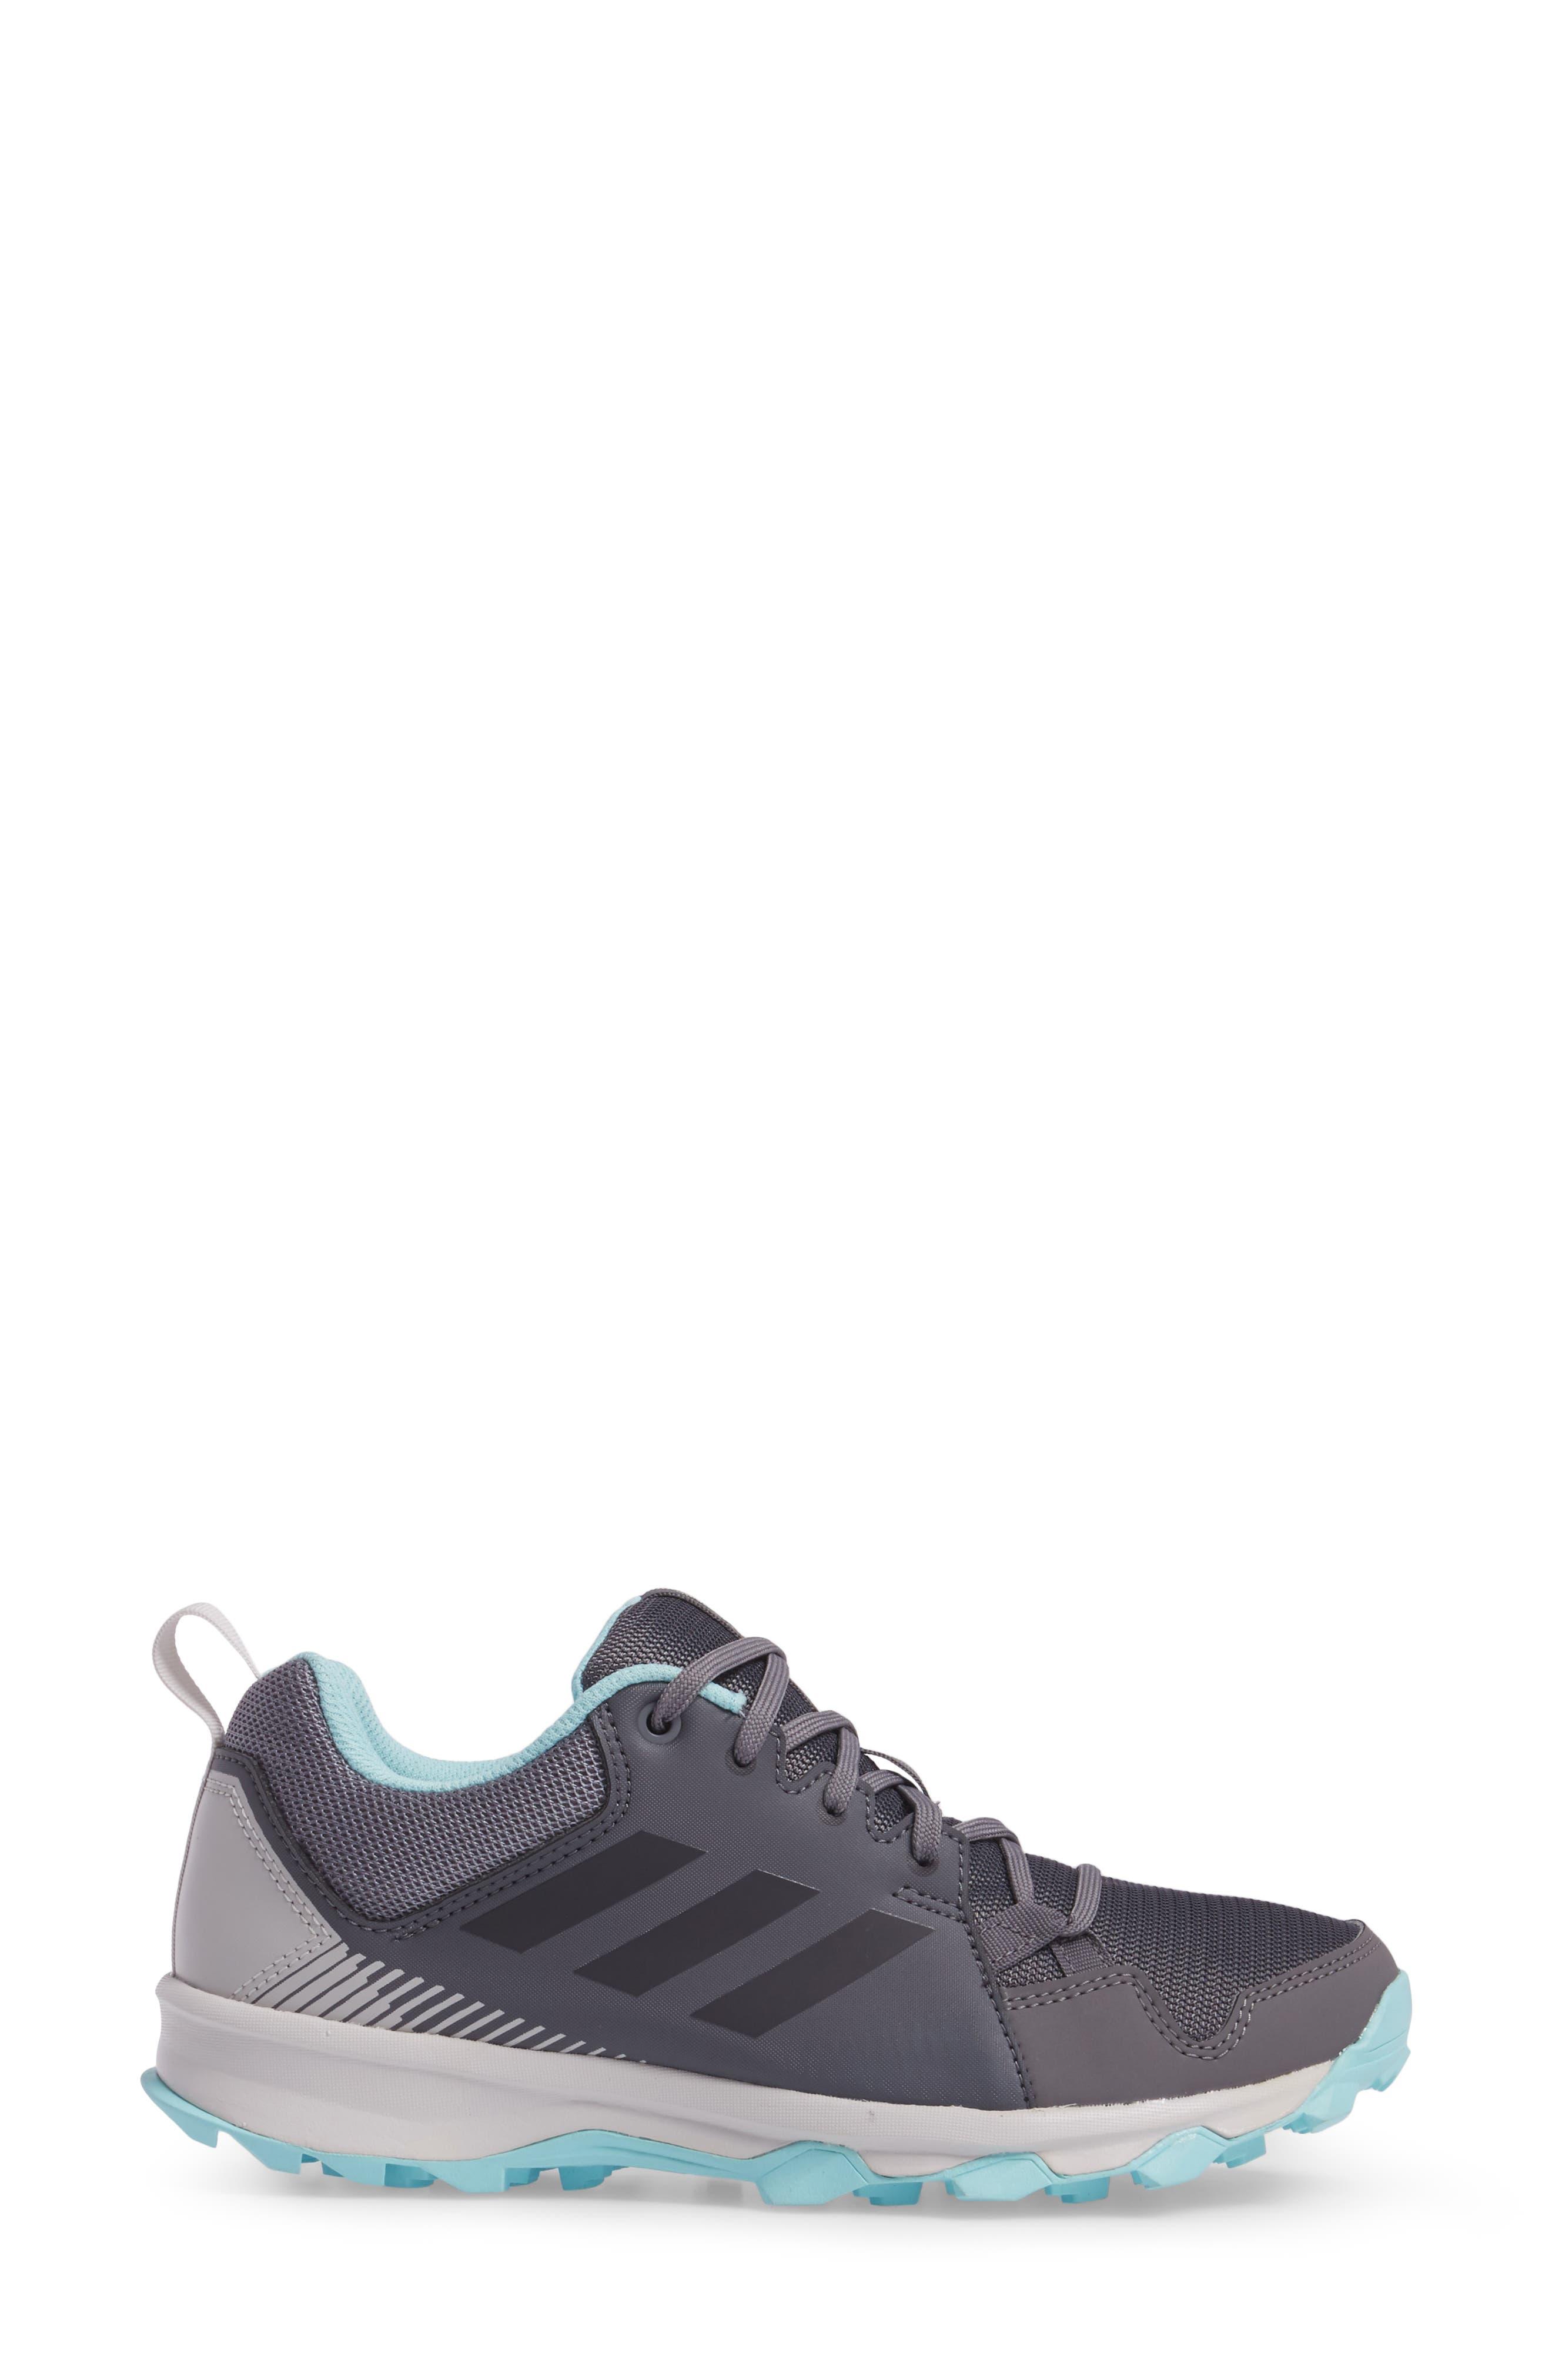 Alternate Image 3  - adidas 'Tracerocker' Athletic Sneaker (Women)